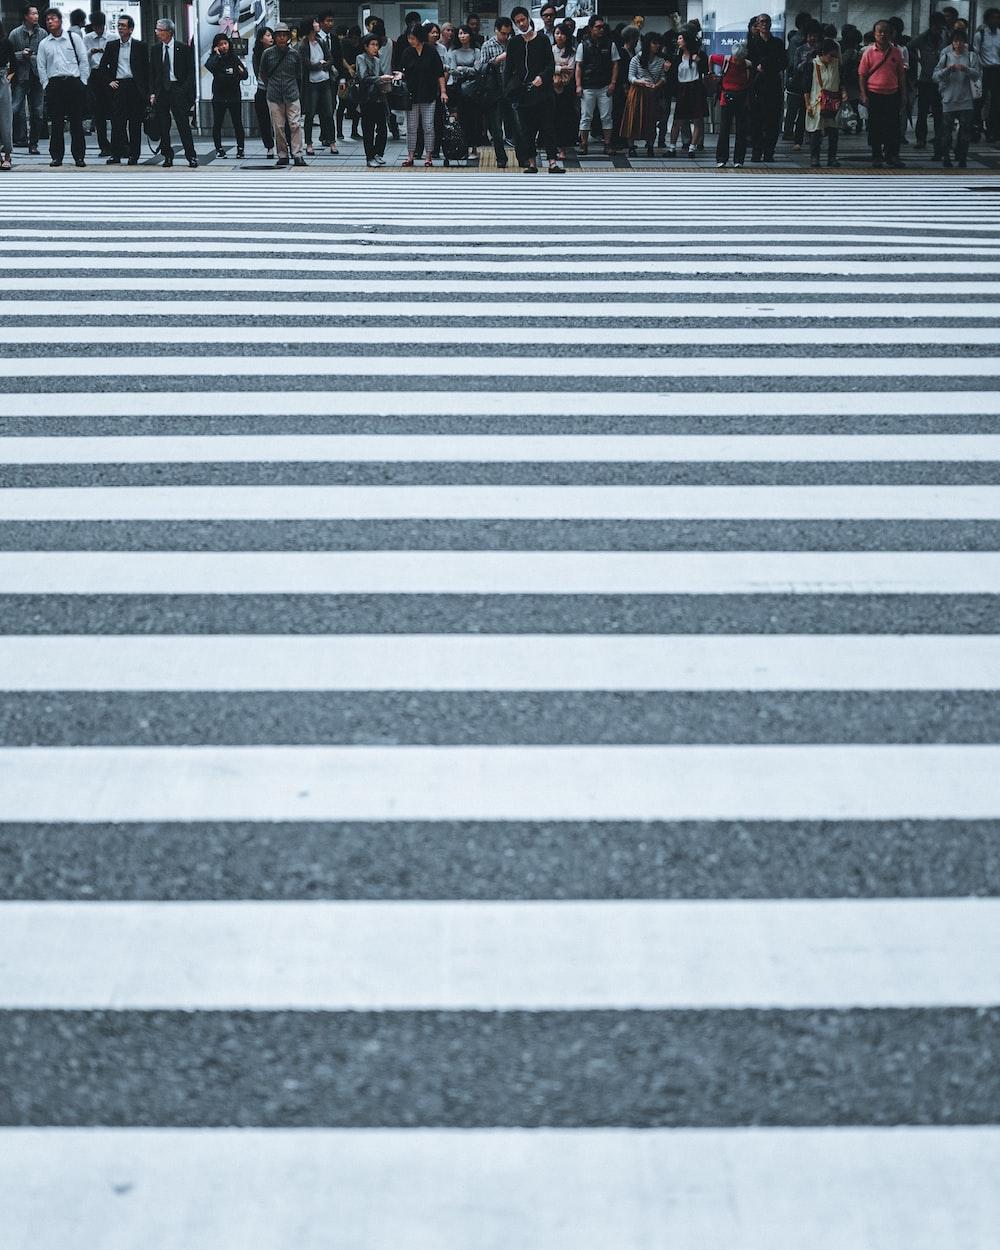 white and black stripe road